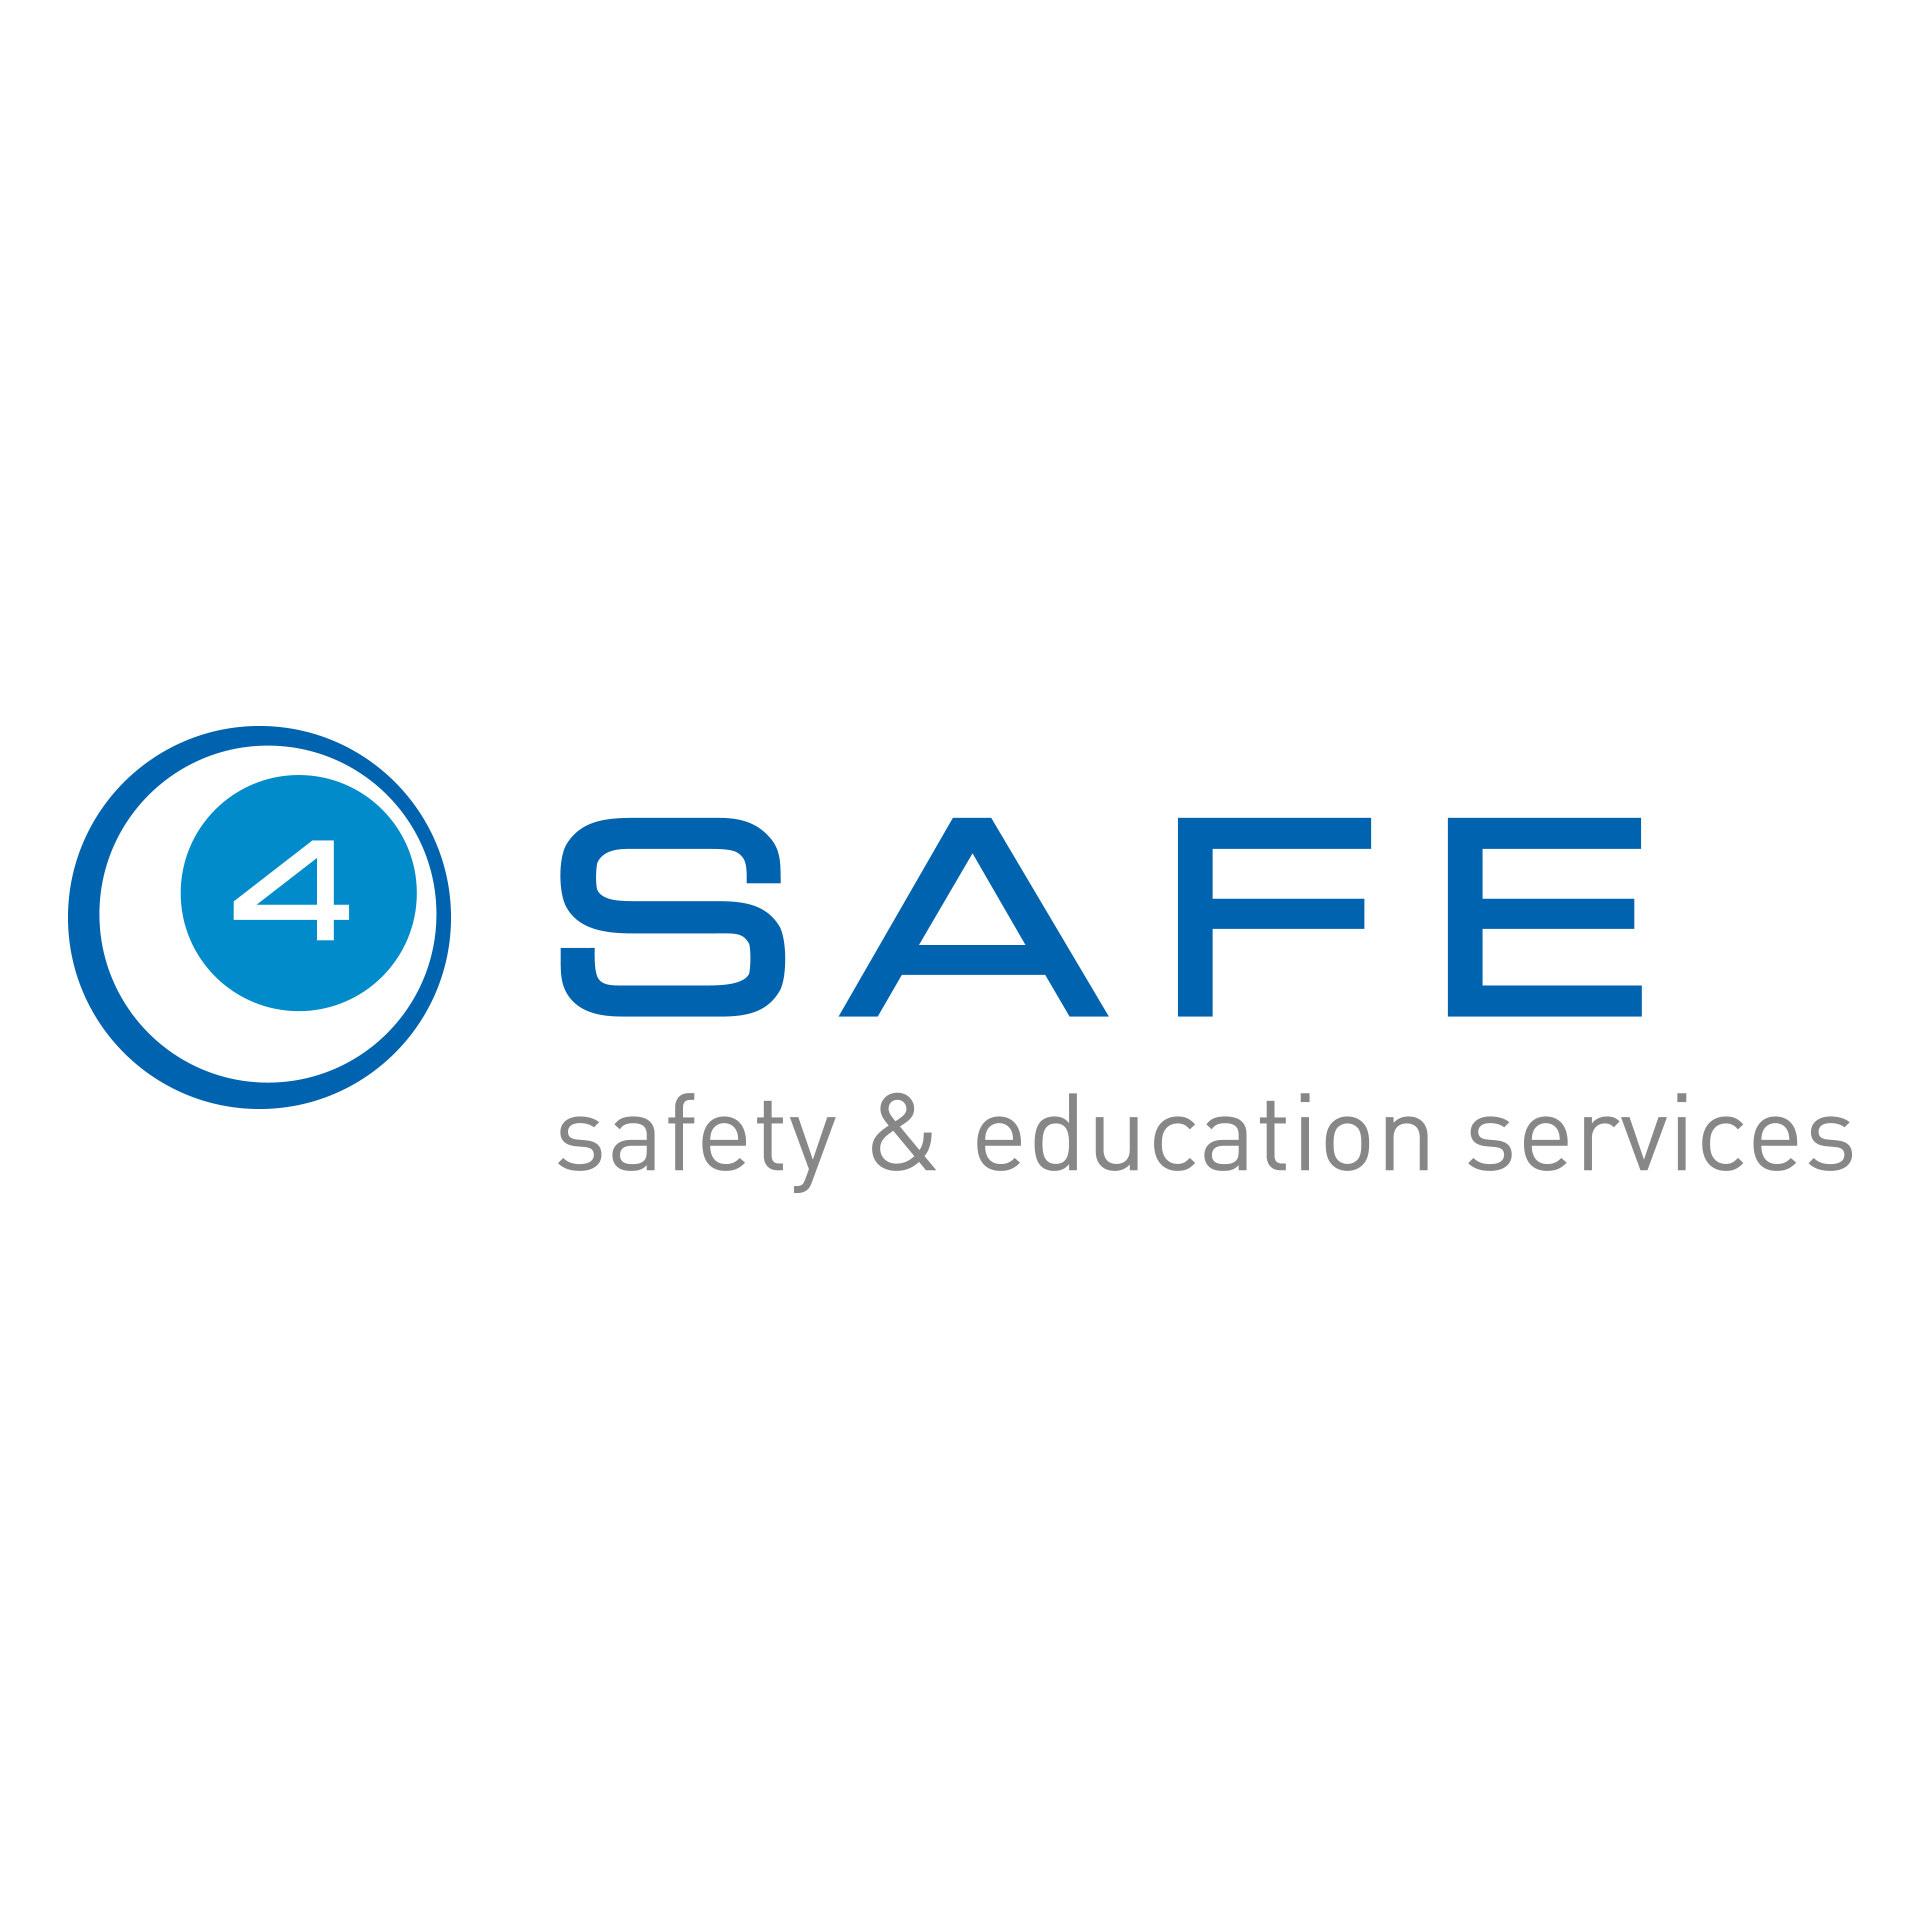 4SAFE_Logo.jpg